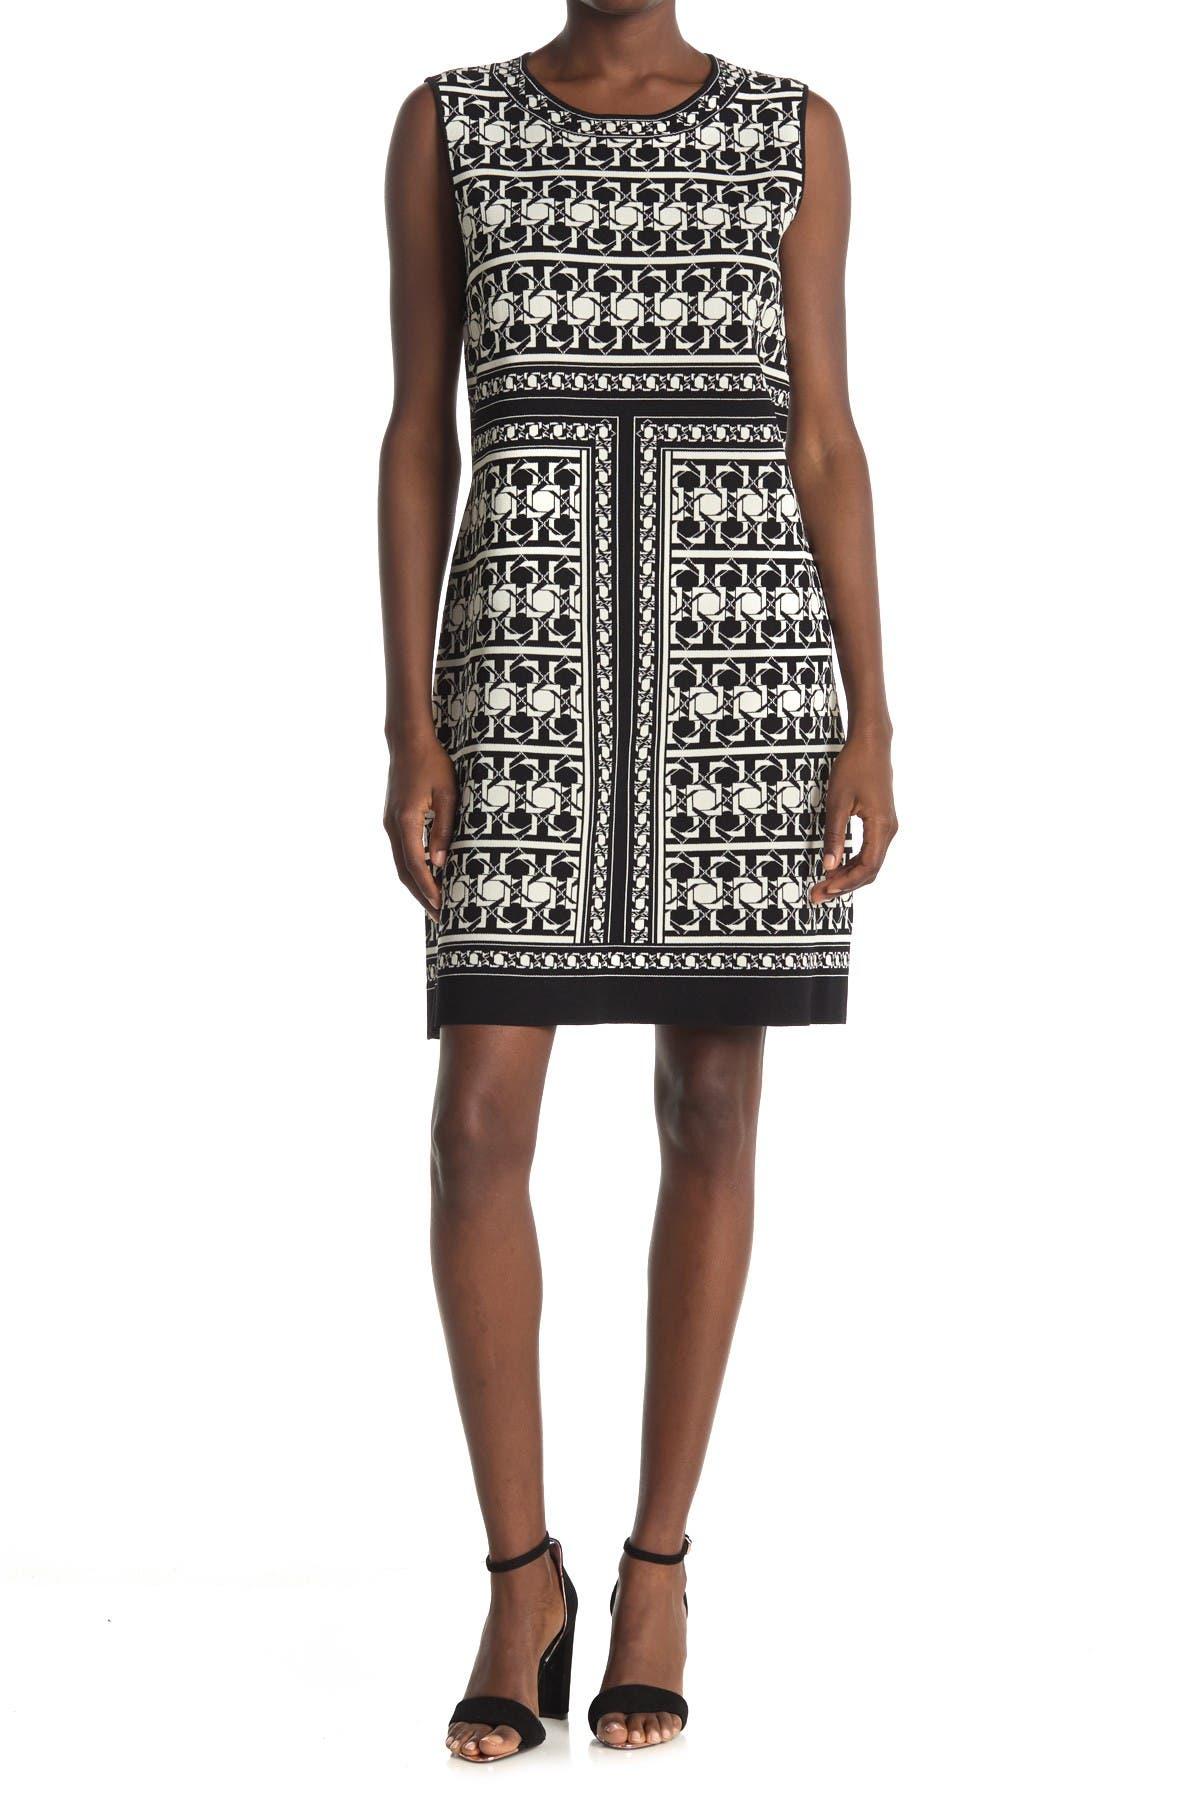 Image of Ted Baker London Jammiea Geo Print Jacquard Knit Dress